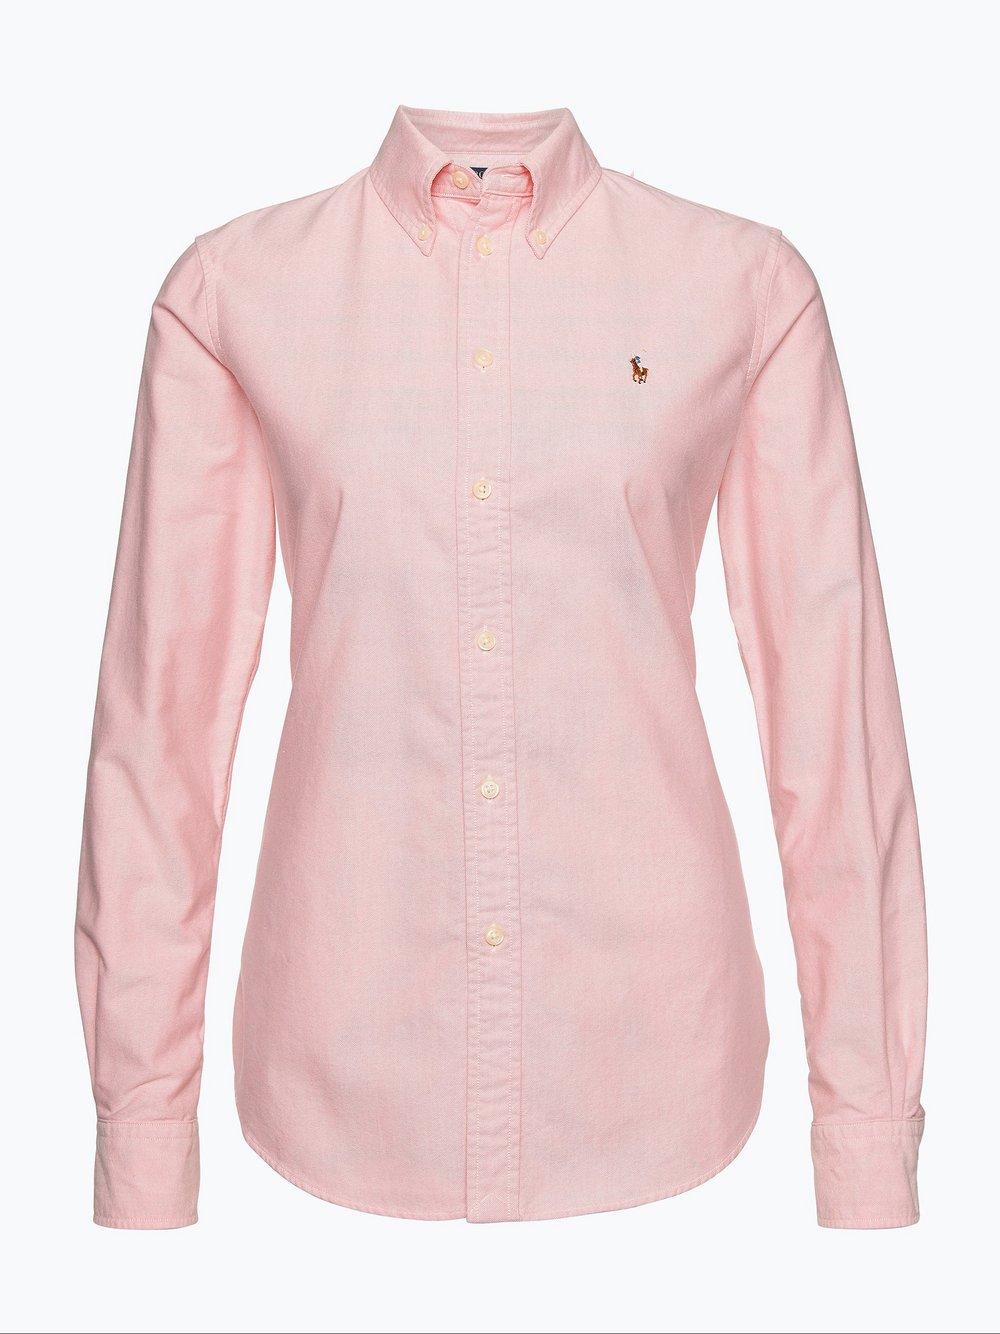 Polo Ralph Lauren - Bluzka damska, różowy